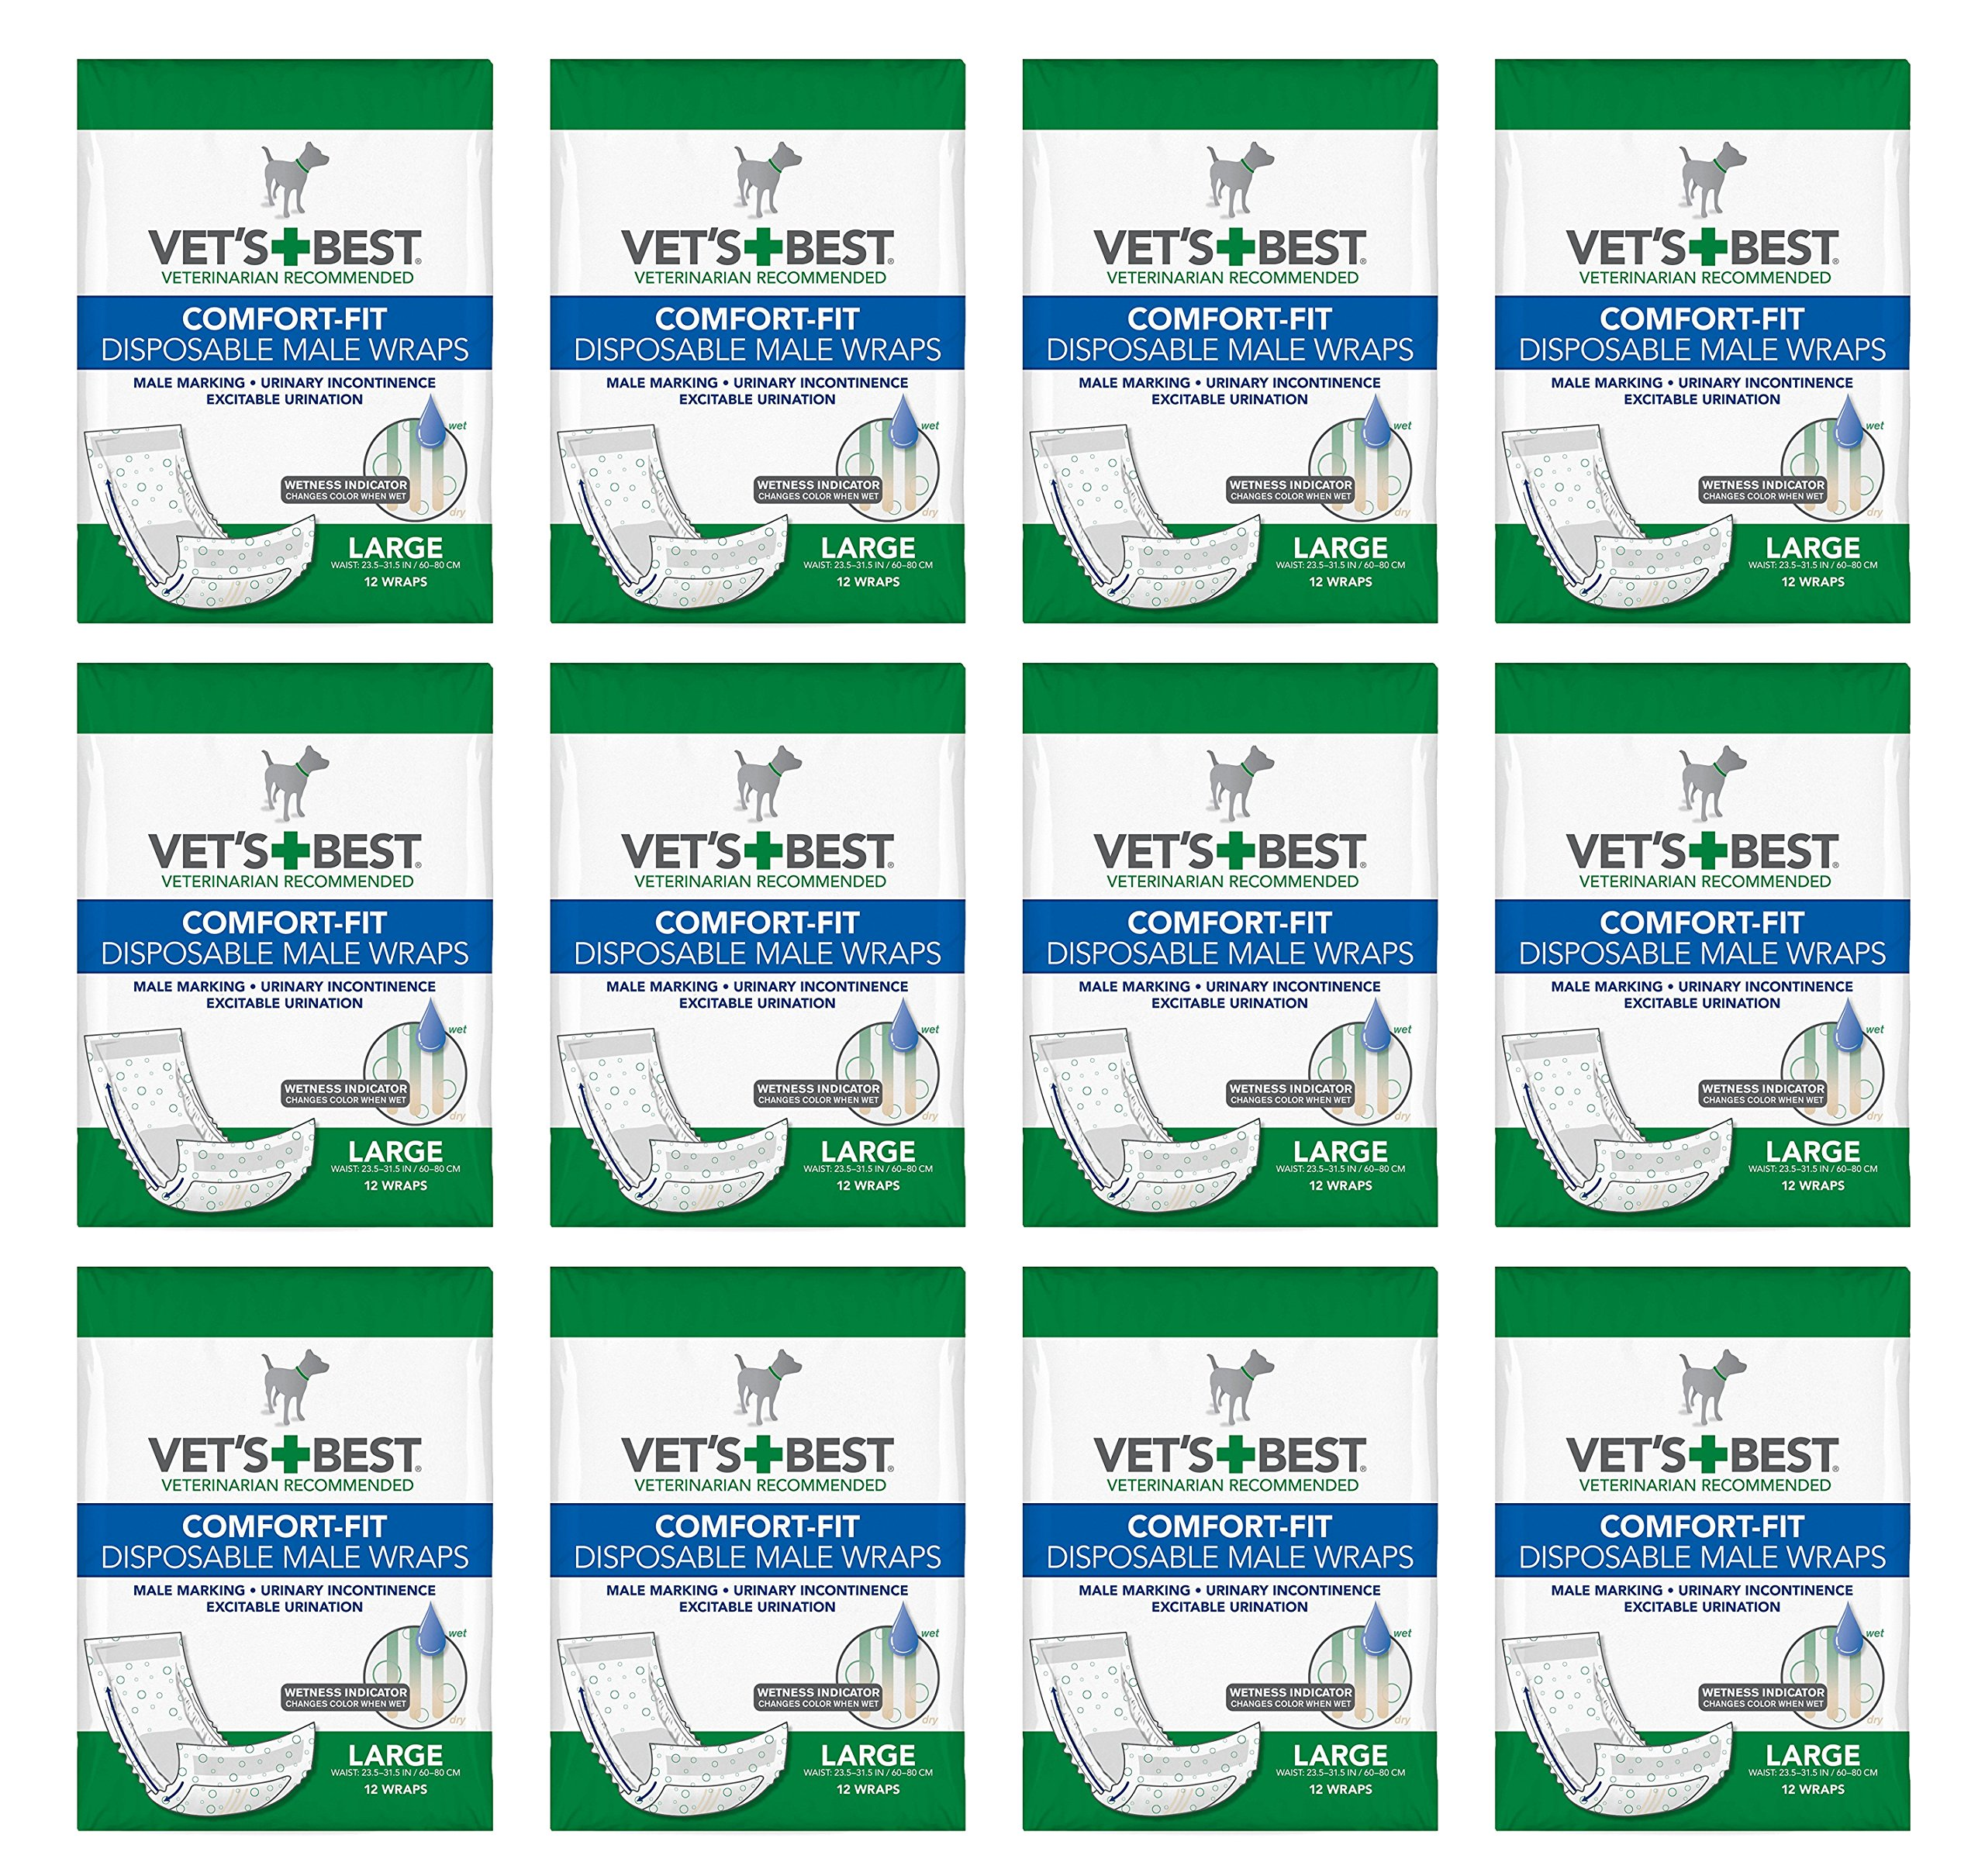 Vet's Best Comfort-Fit Disposable Male Wraps Large (12x12ct) (144 count)